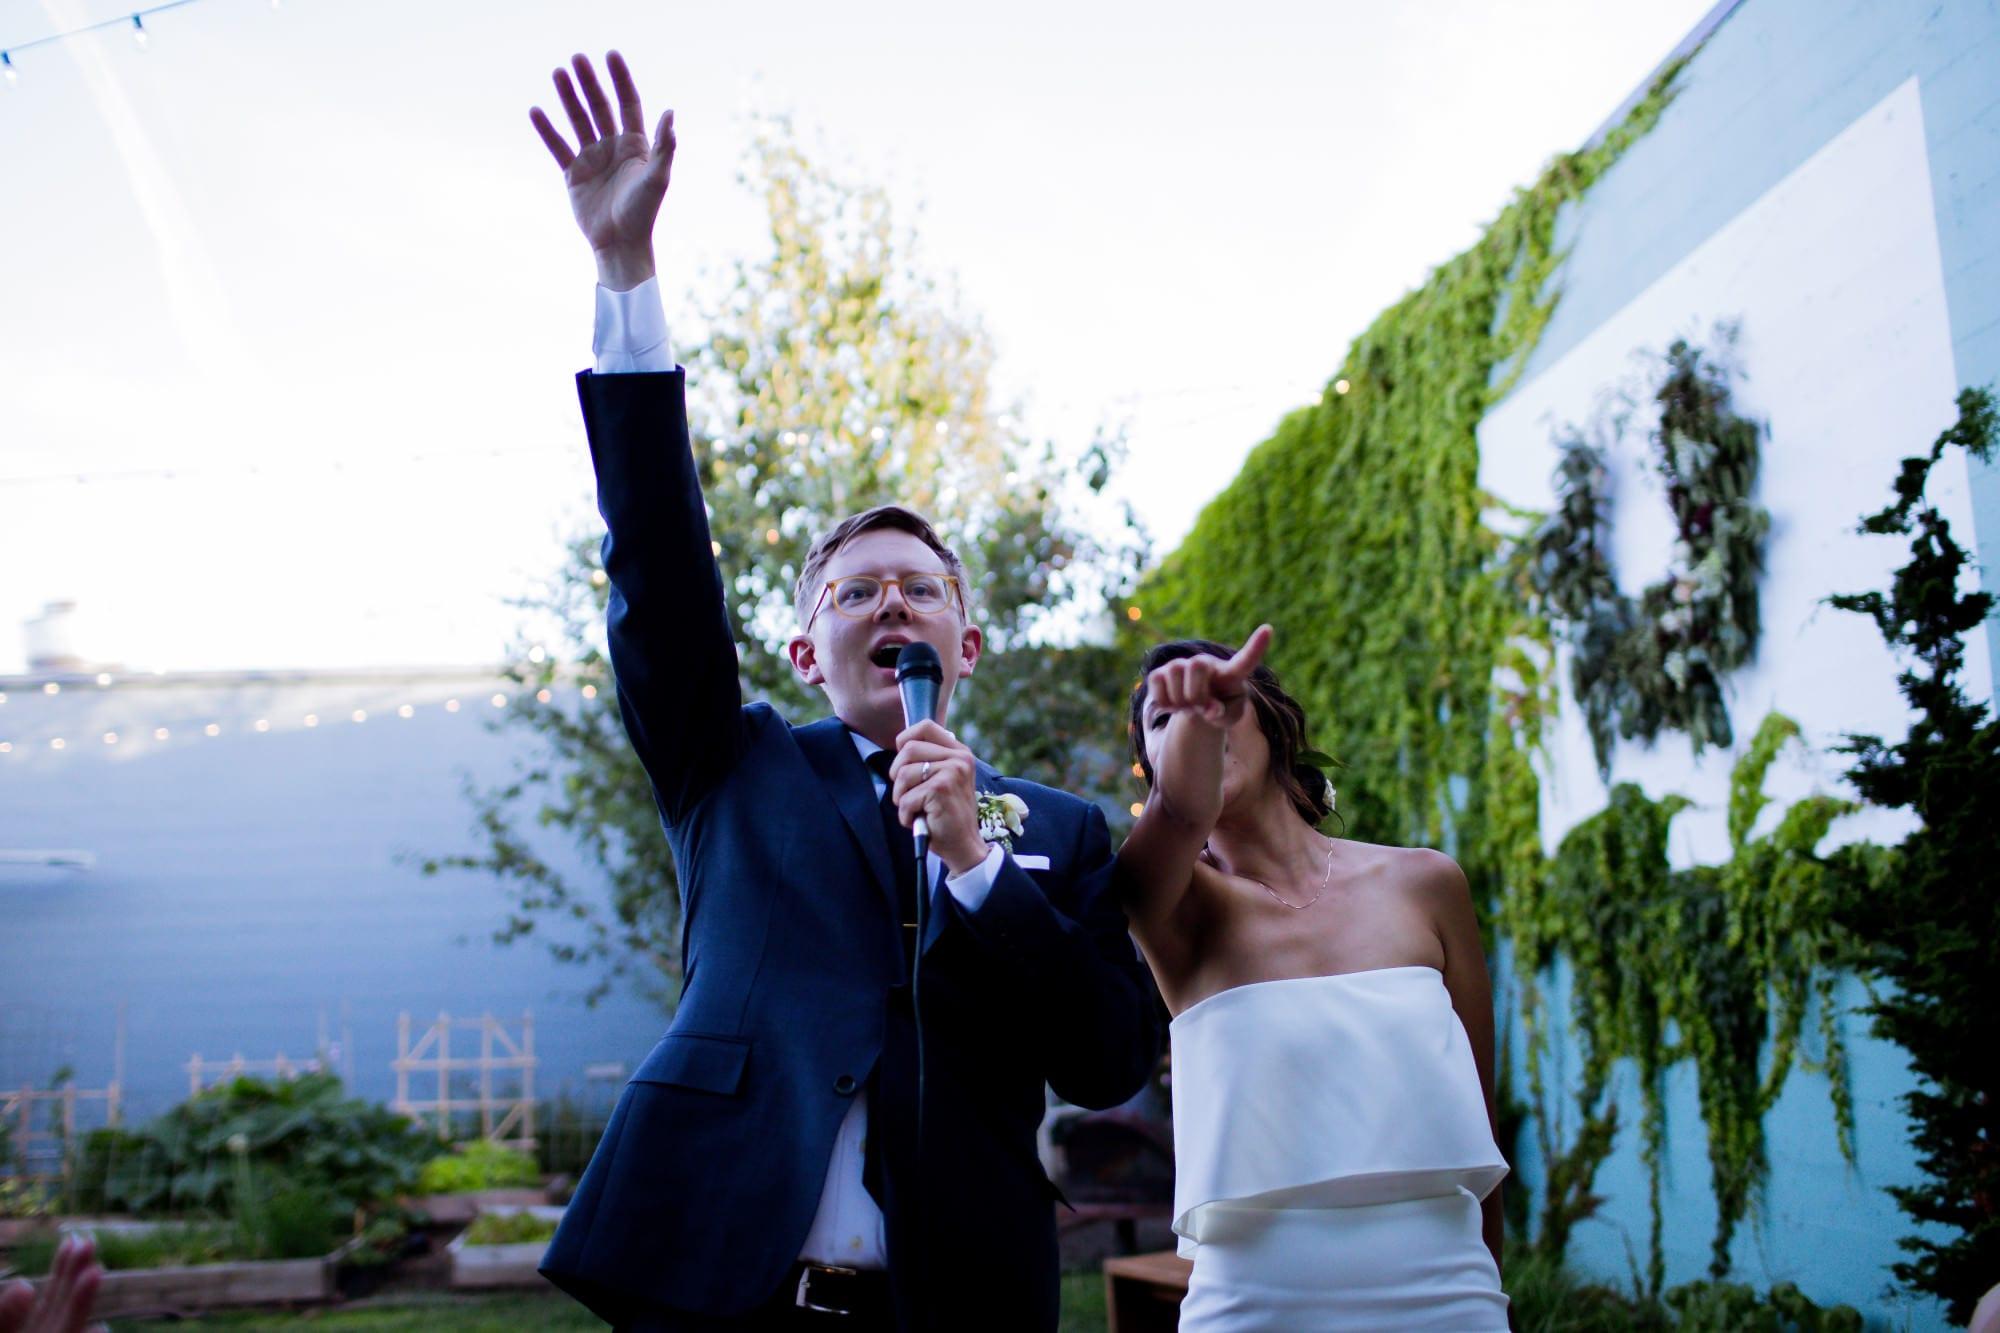 Han Oak Wedding, Portland, Oregon by Stark Photography (15)